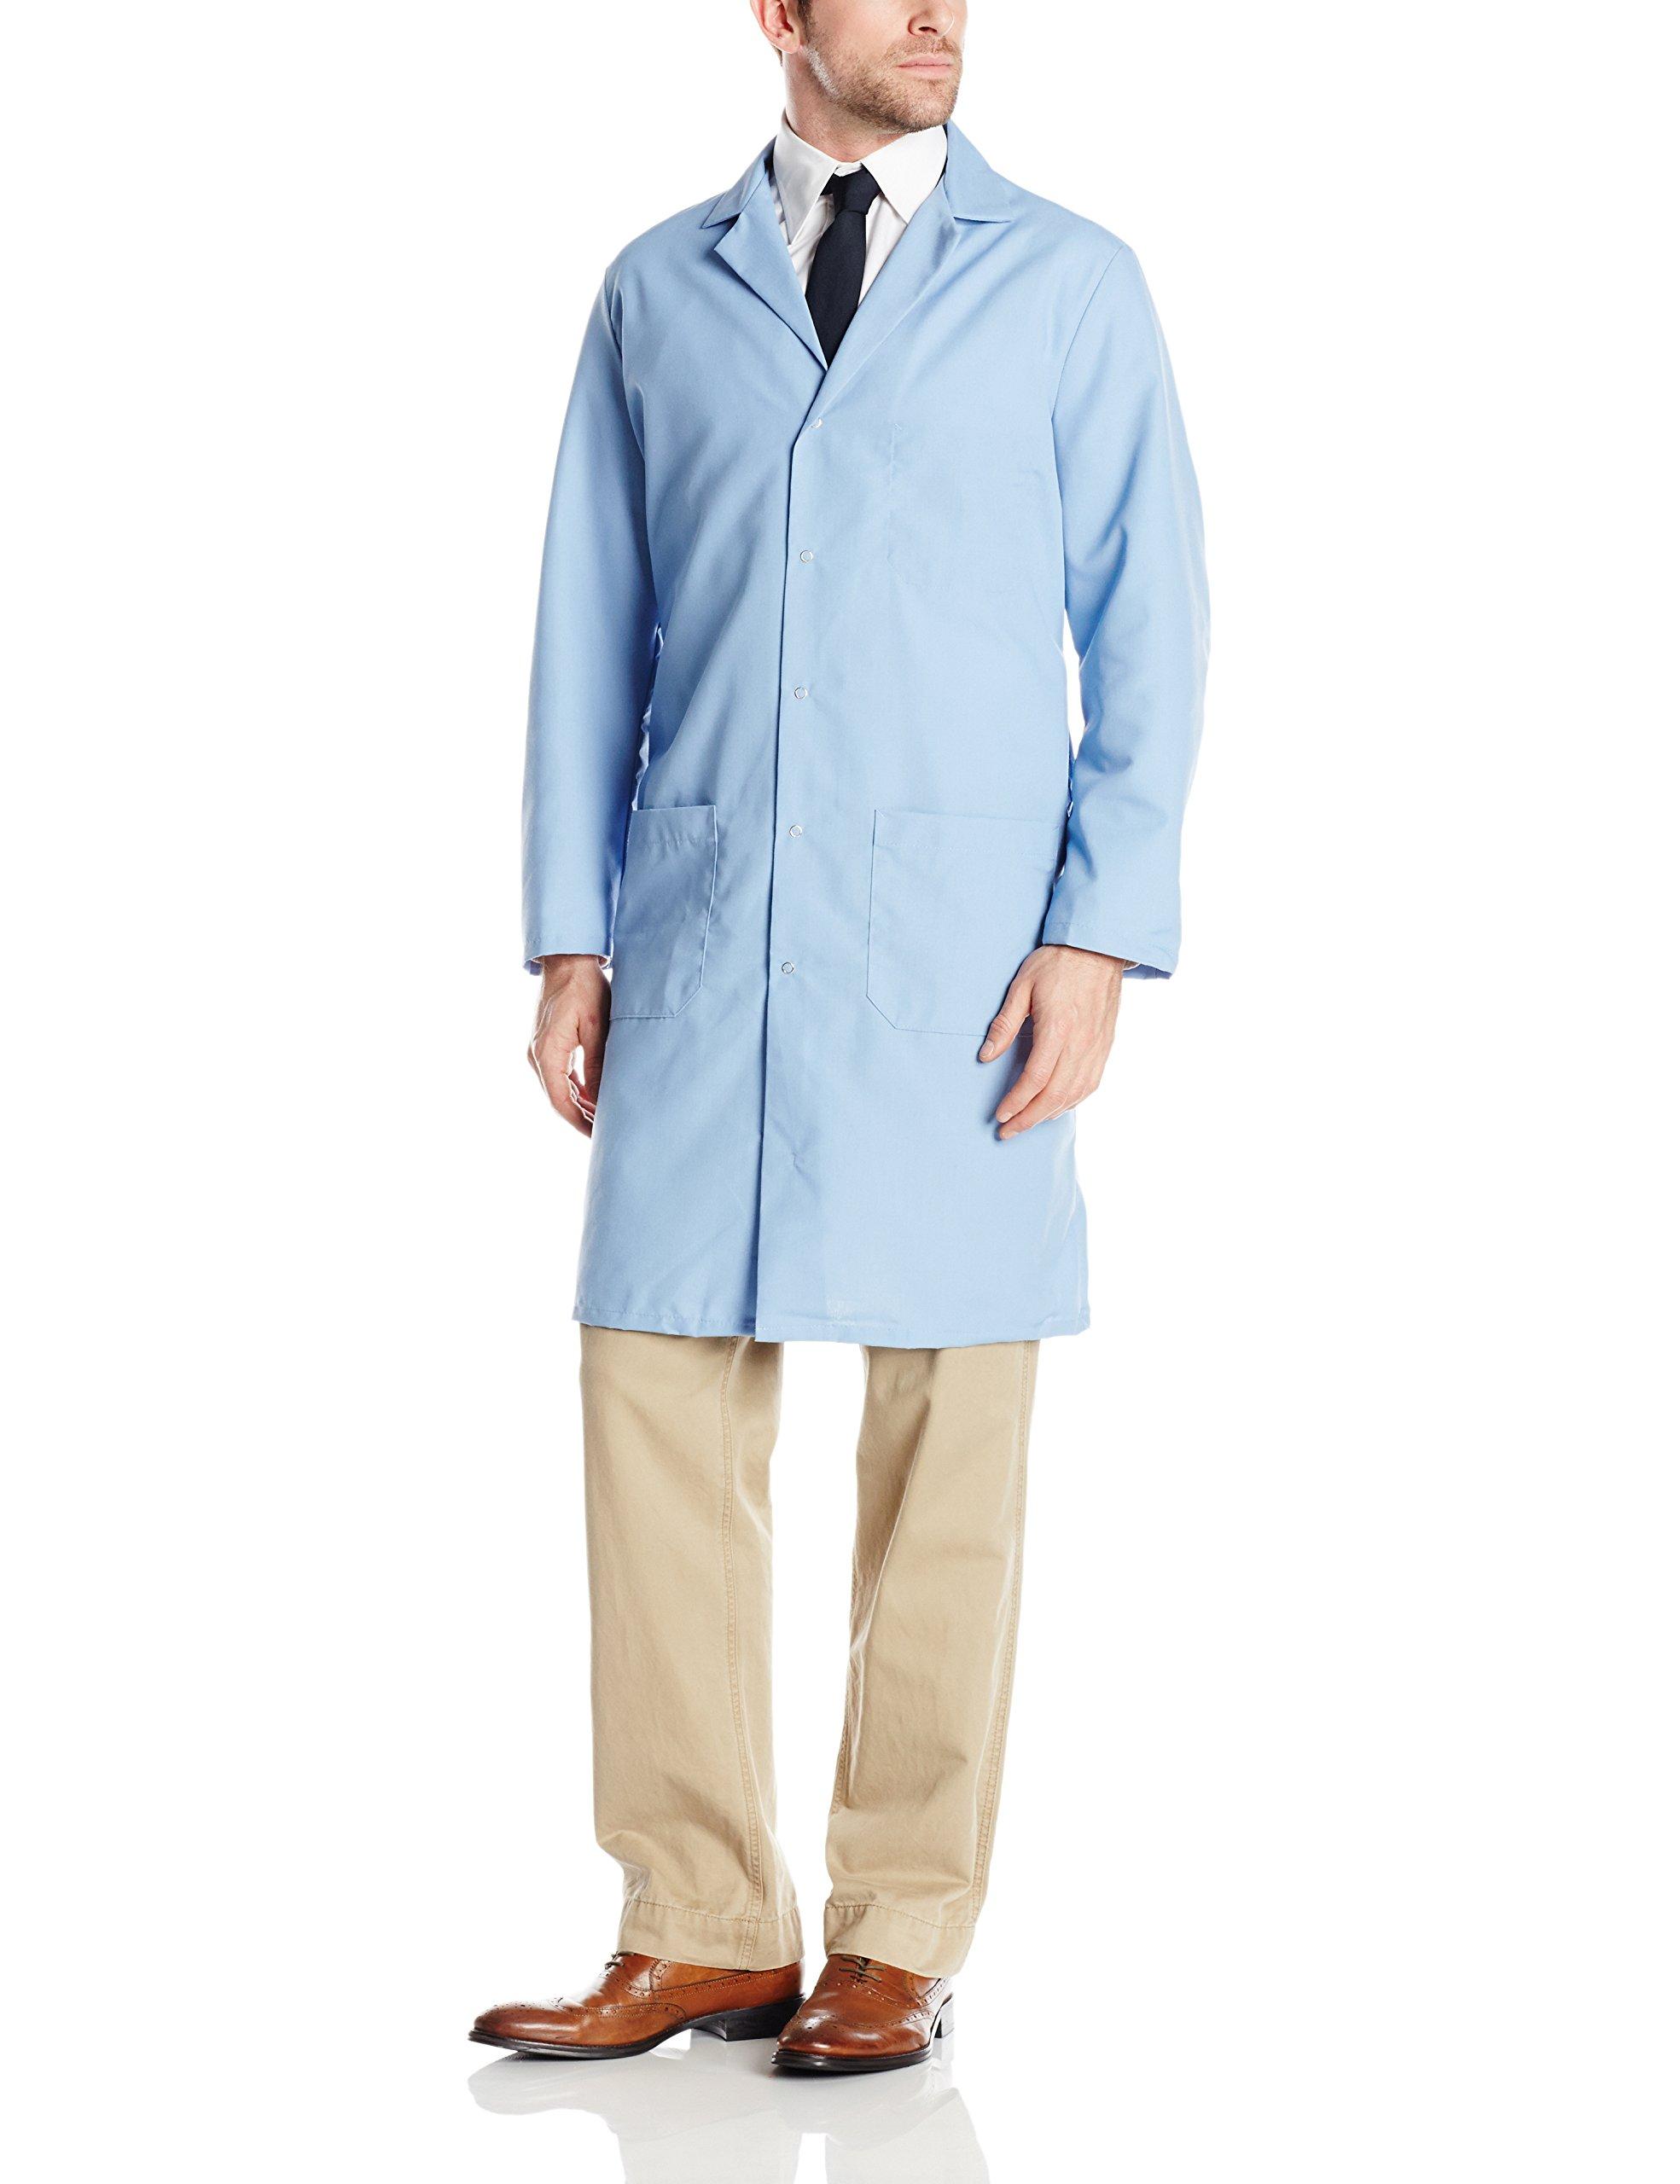 Red Kap Men's Lab Coat, Light Blue, Small by Red Kap (Image #1)